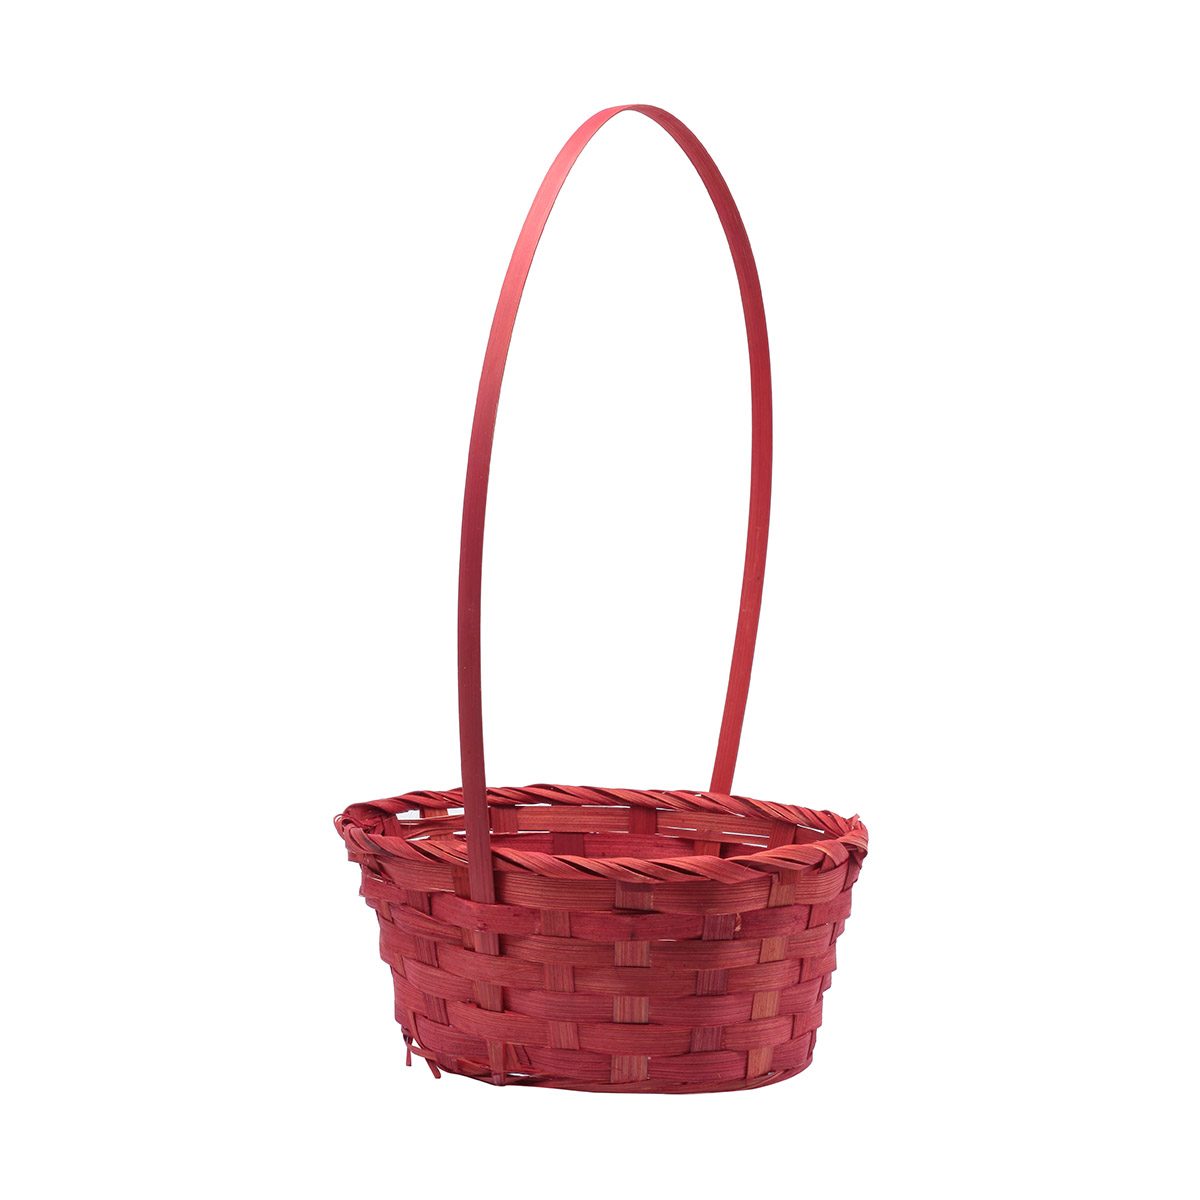 71221 Корзина плетеная бамбук 20*16*9см красный